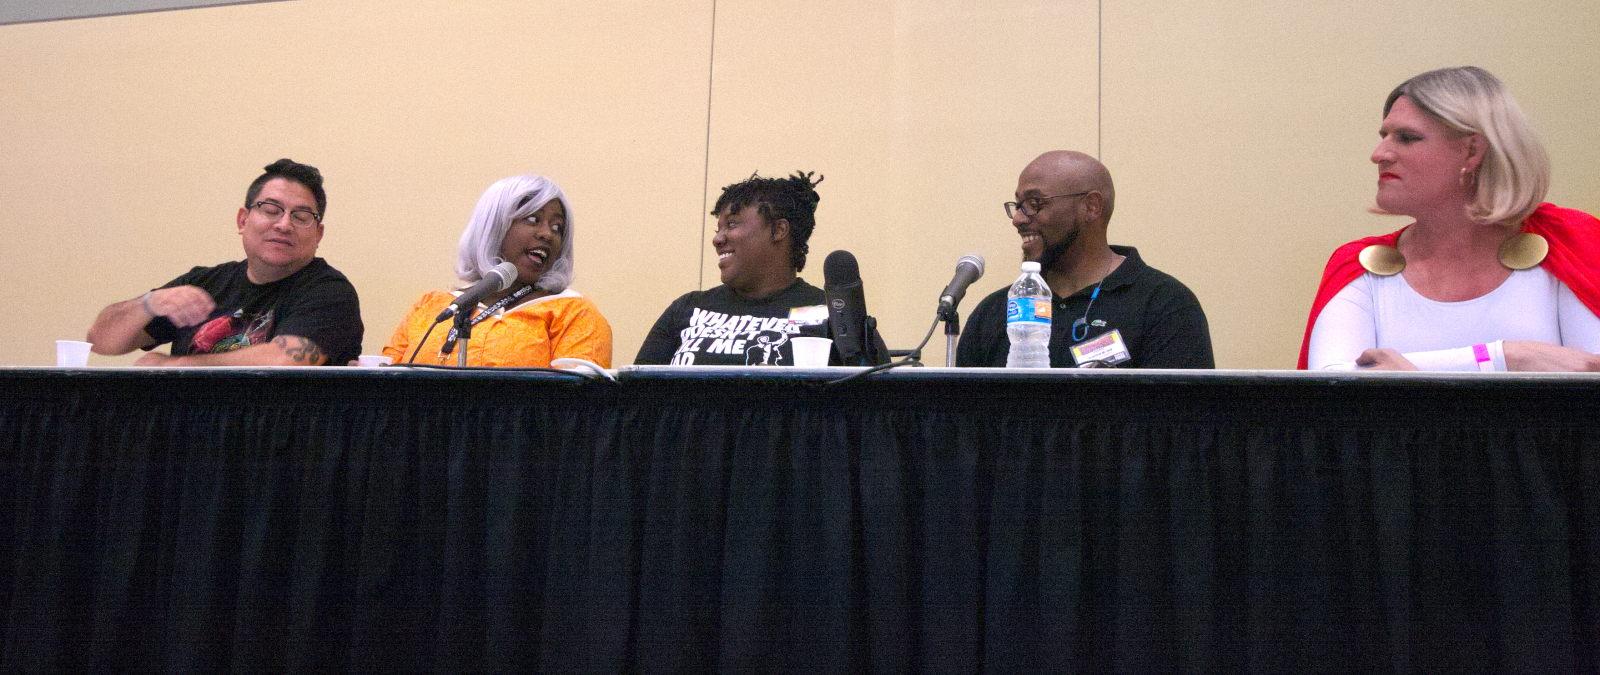 Diversity in Comics Panel